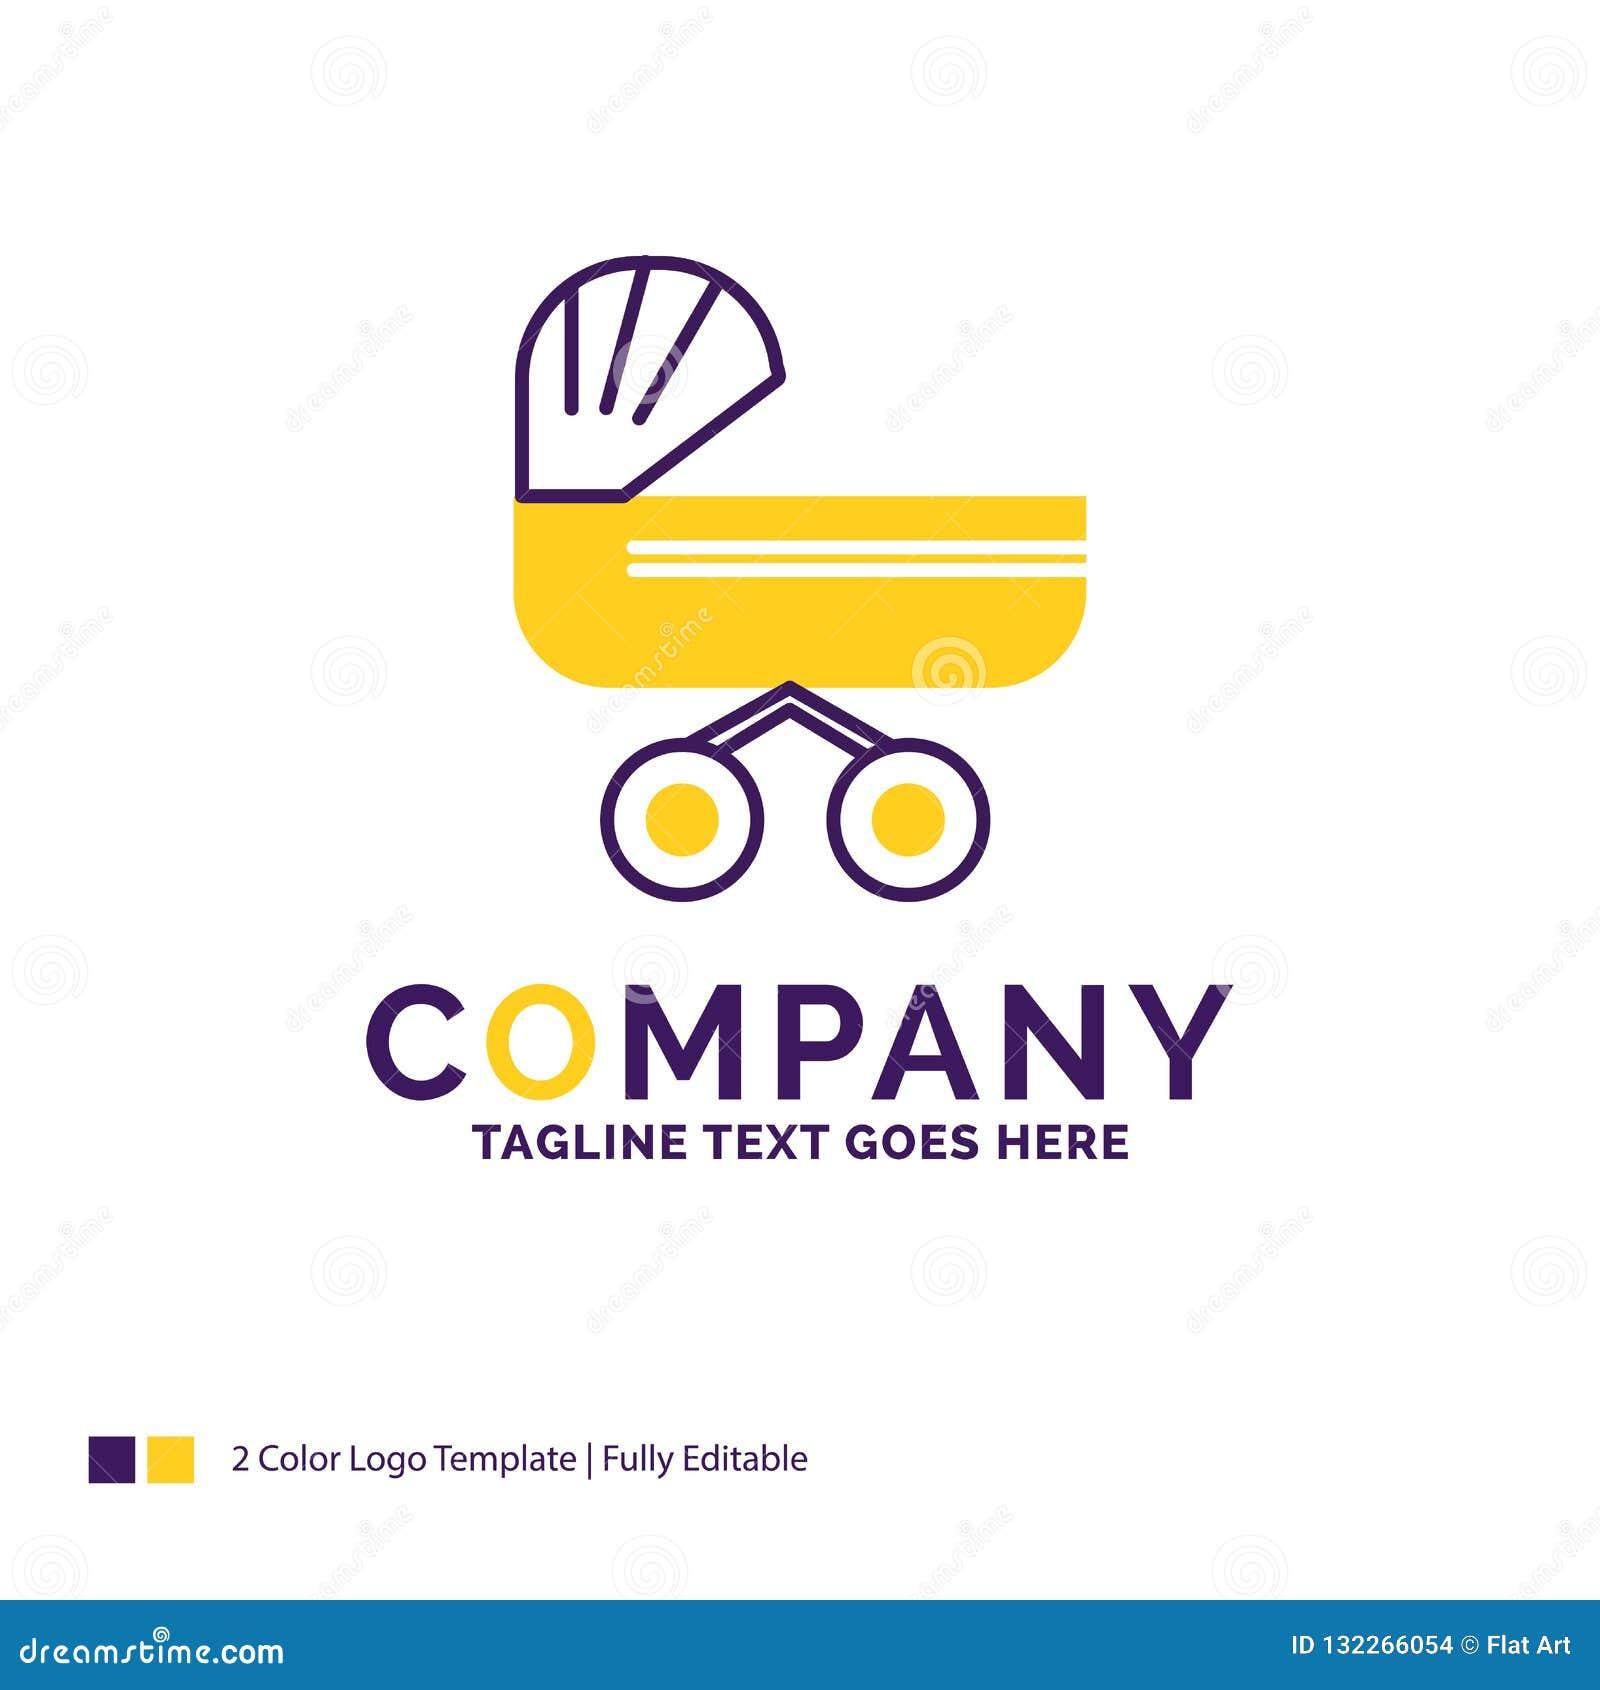 Company Name Logo Design For trolly, baby, kids, push, stroller